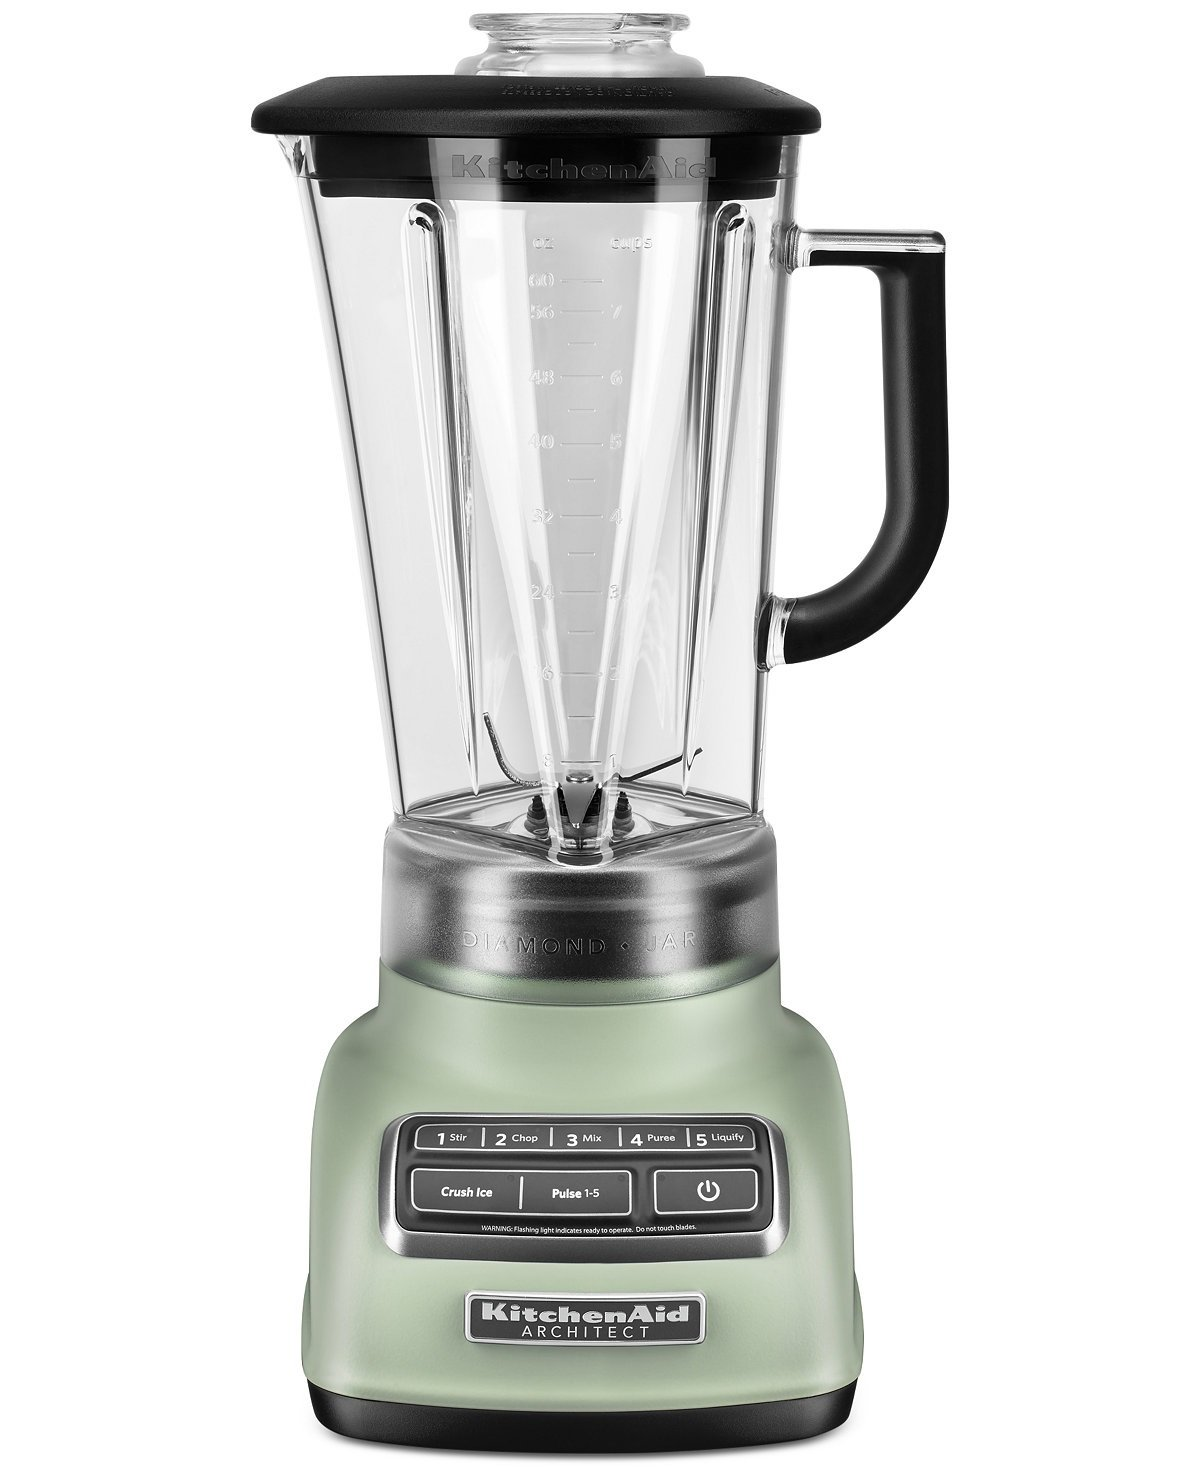 KitchenAid RKSB1570PI 5-Speed Blender with 56-Ounce BPA-Free Pitcher - Matte Pistachio (Renewed)